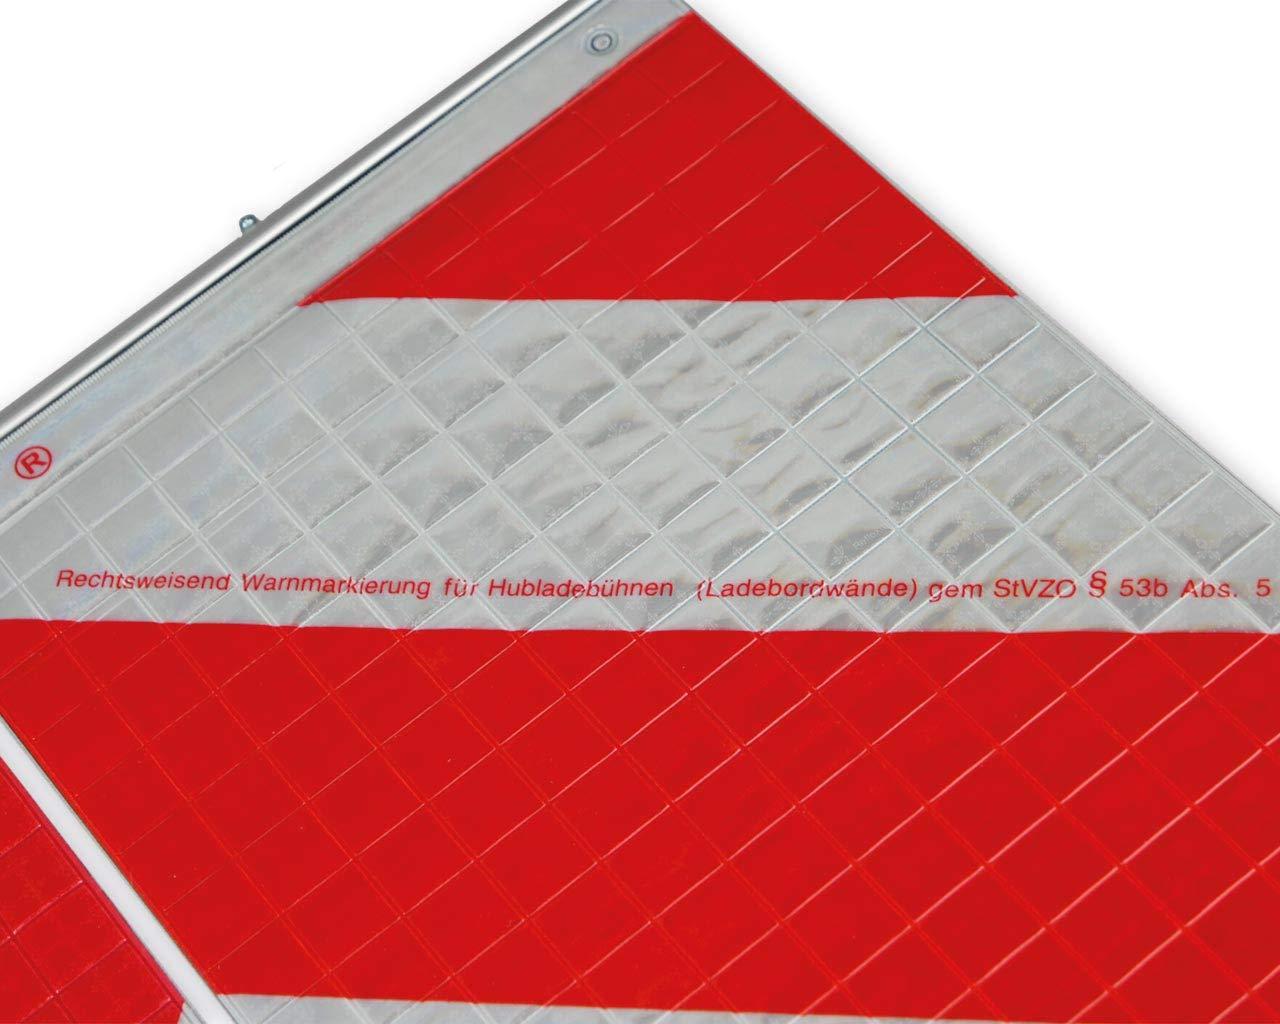 SOY-KFZ 1 Set Warnflaggen 430x250mm LKW Ladebordwand inkl Aluleisten